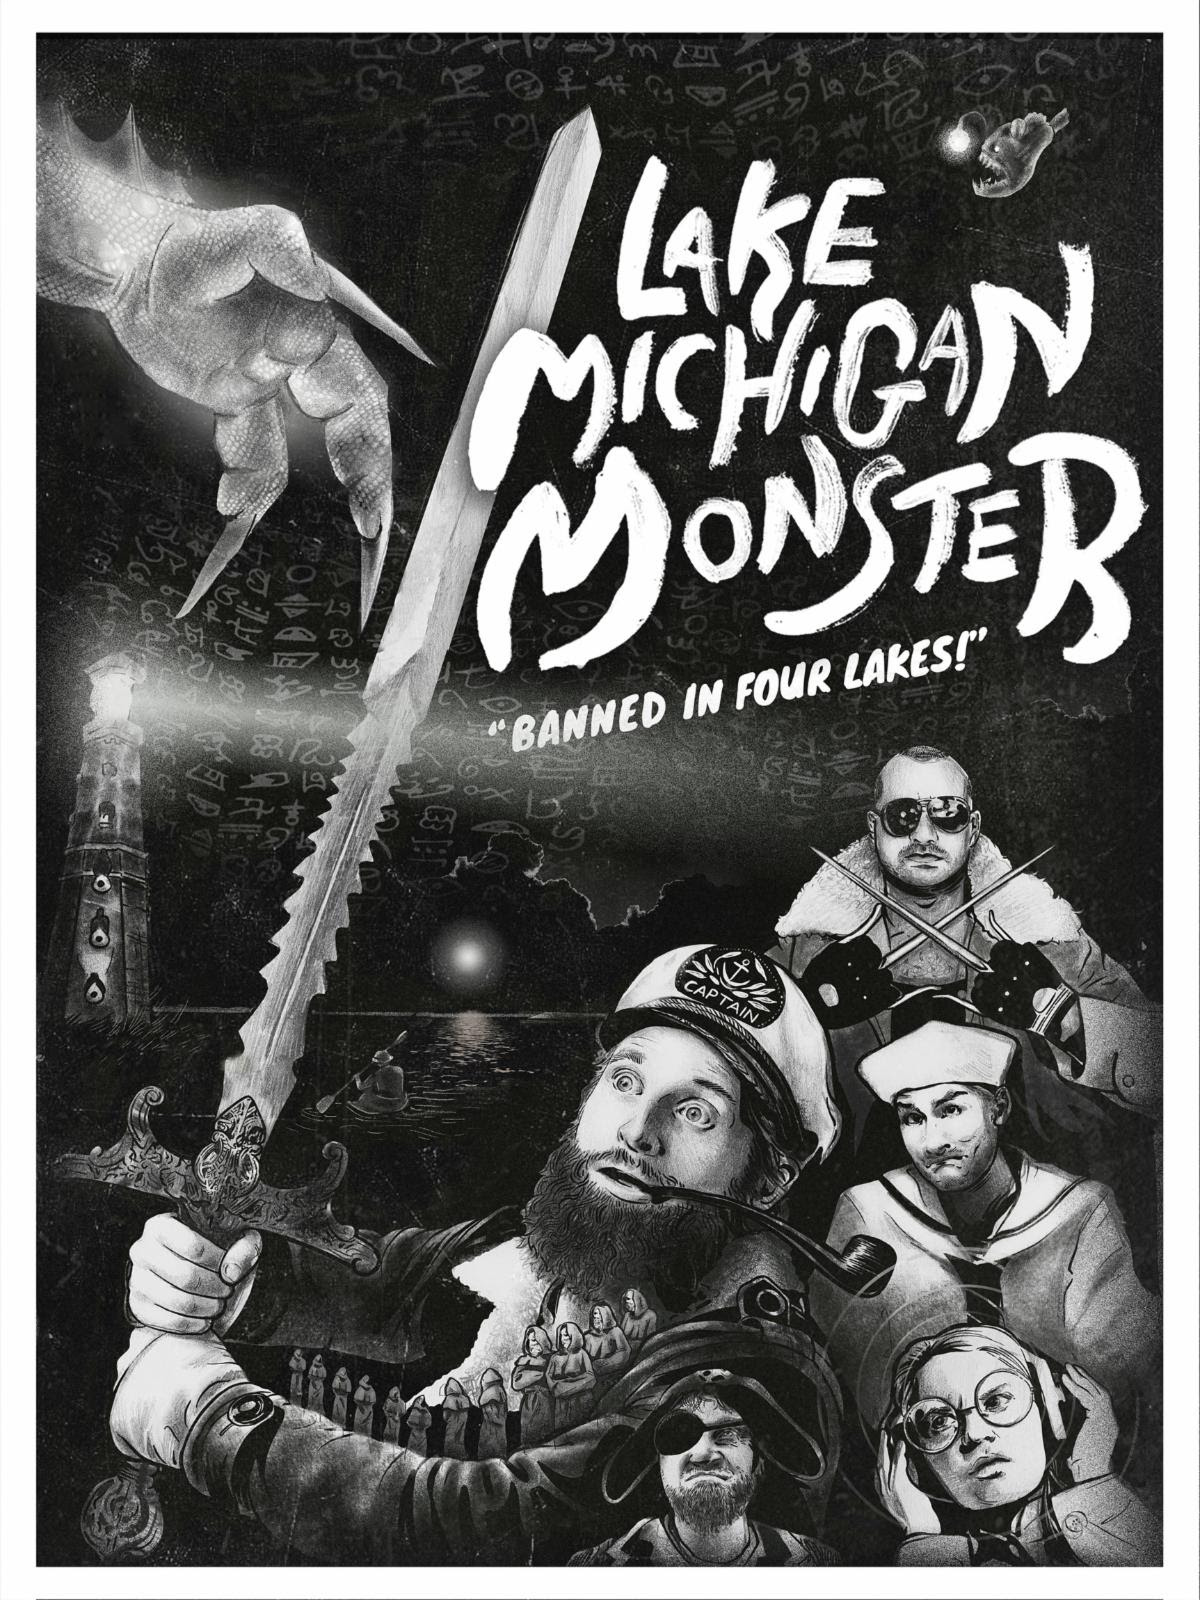 Poster for Lake Michigan Monster